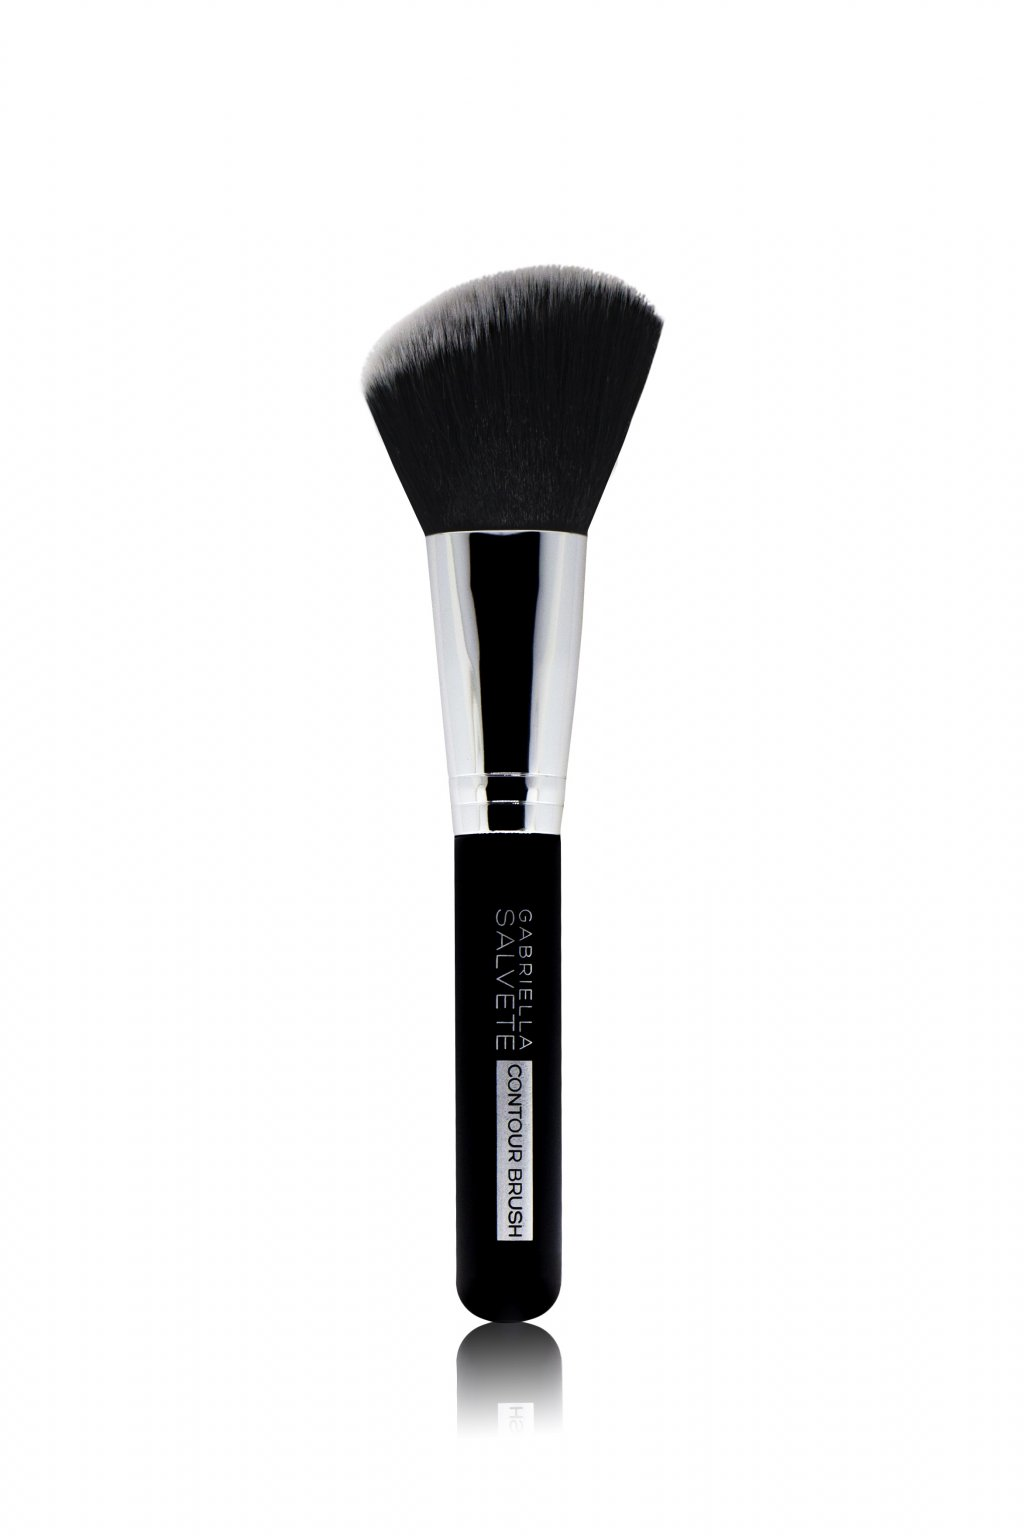 gabriella salvete konturovaci kosmeticky stetec contour brush 1ks